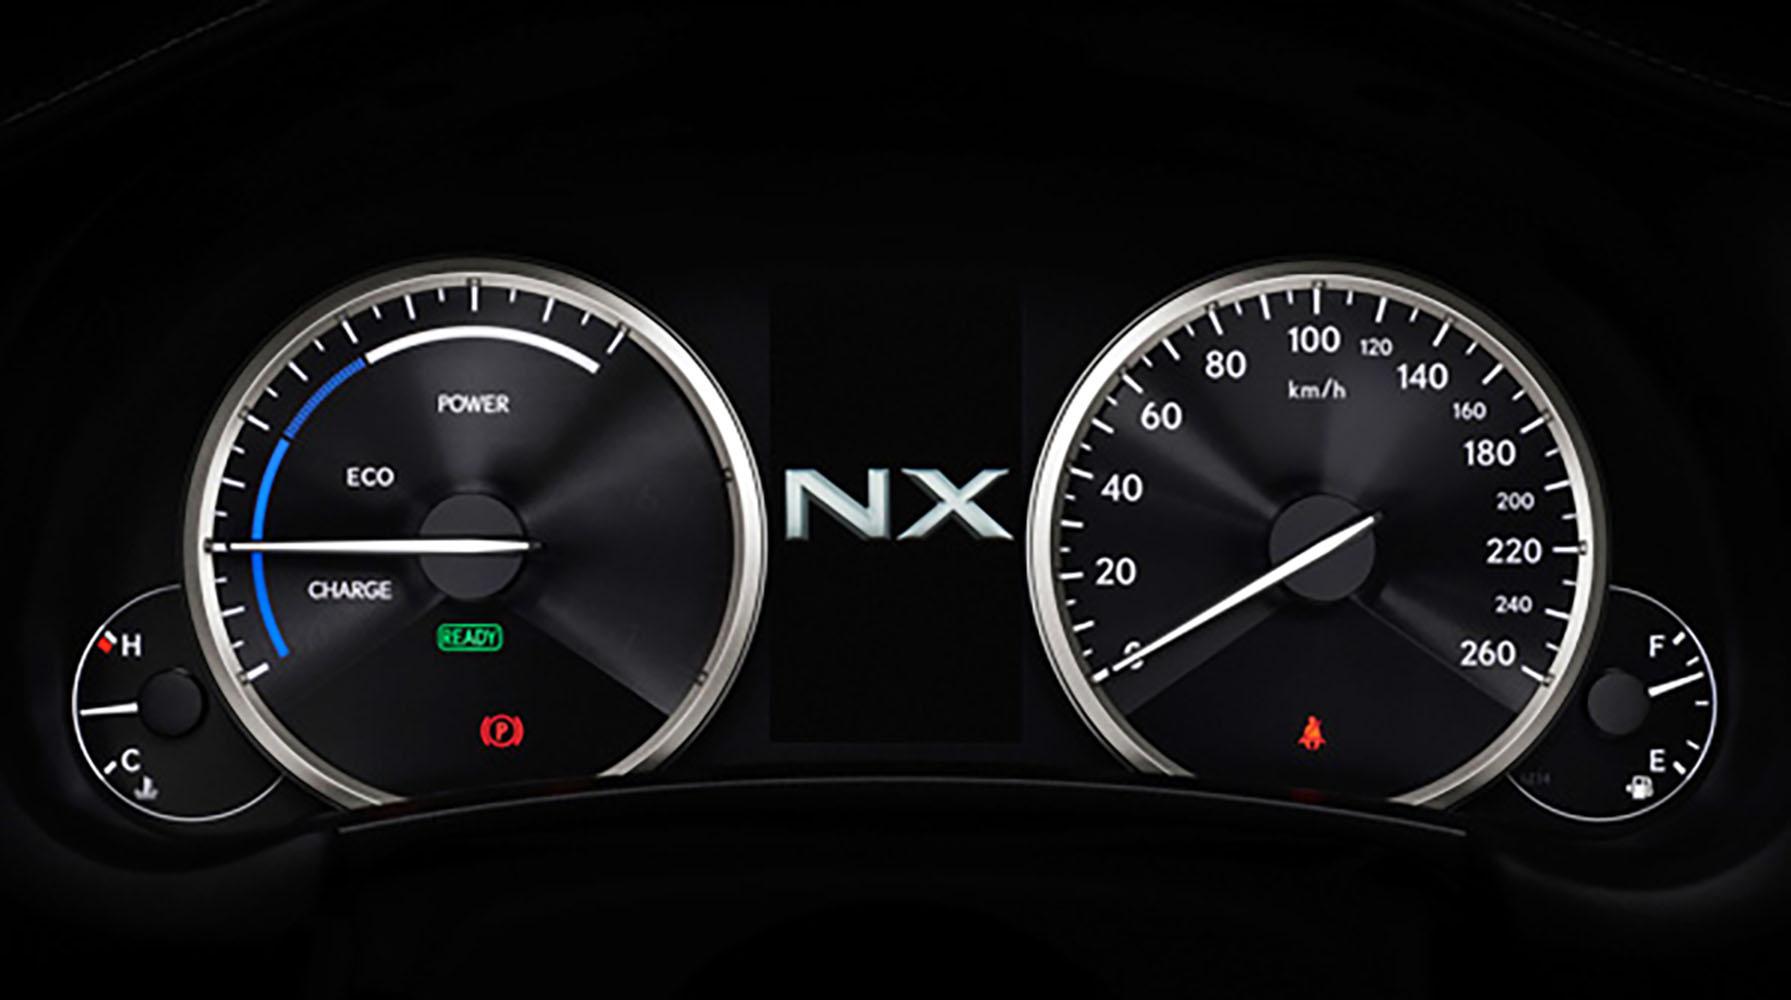 Nx Hybrid System Indicator